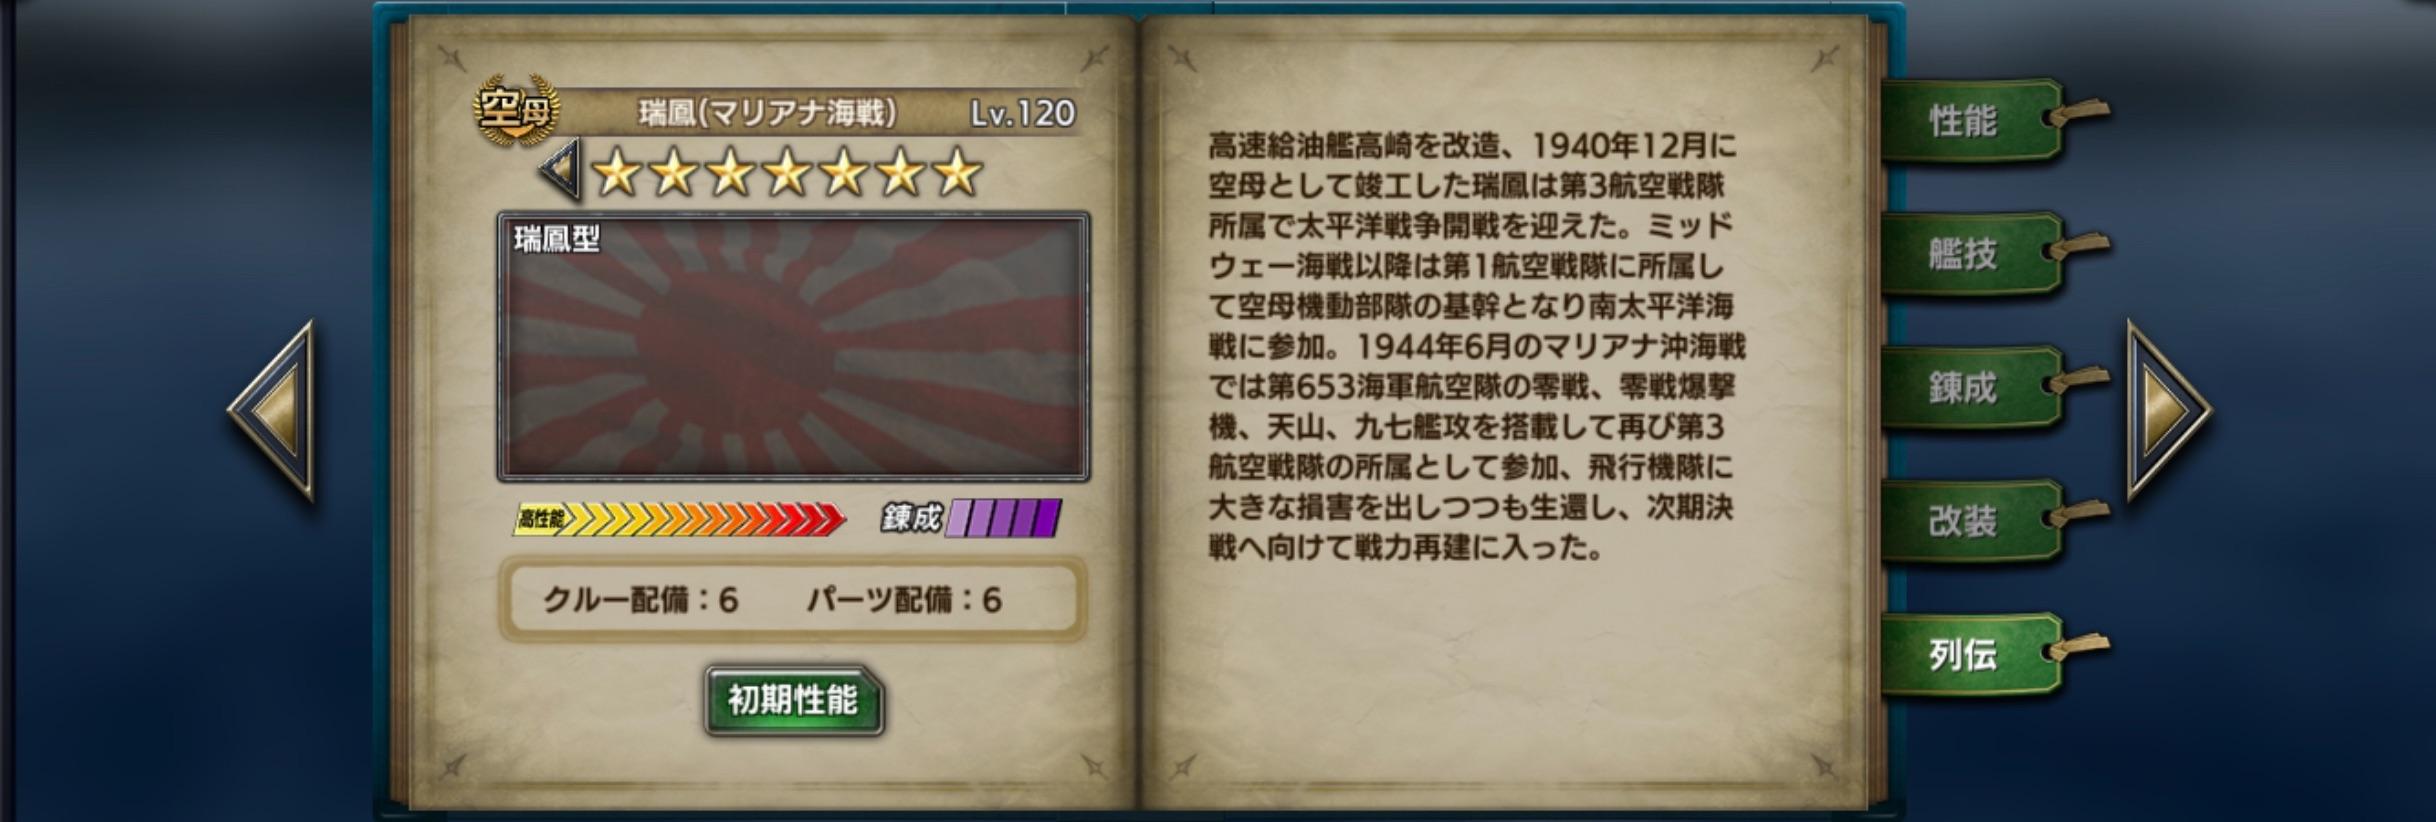 zuihou-history